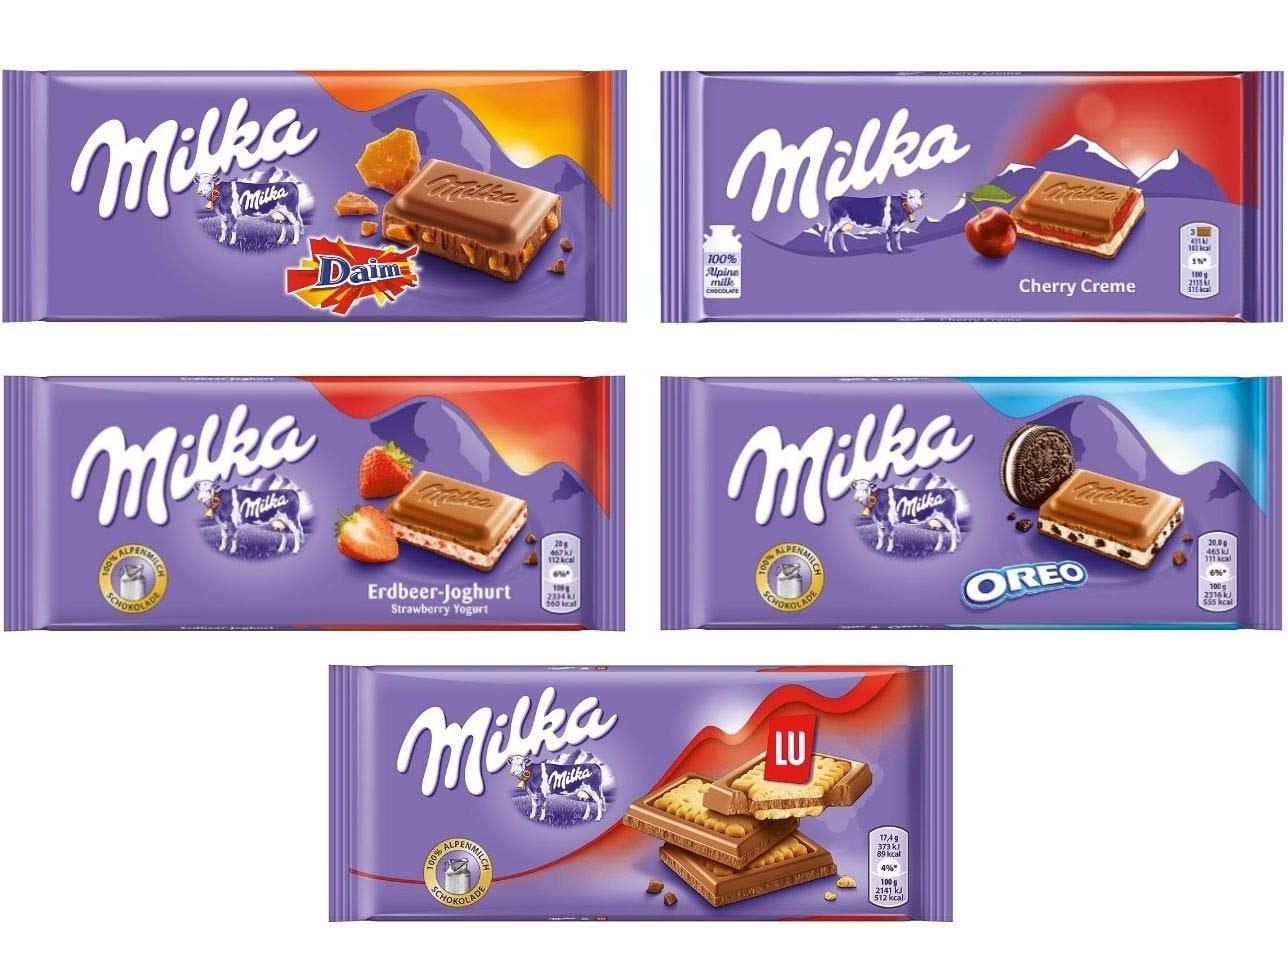 ۳عدد شکلات تخته ای میلکا اورجینال Milka Chocolate |